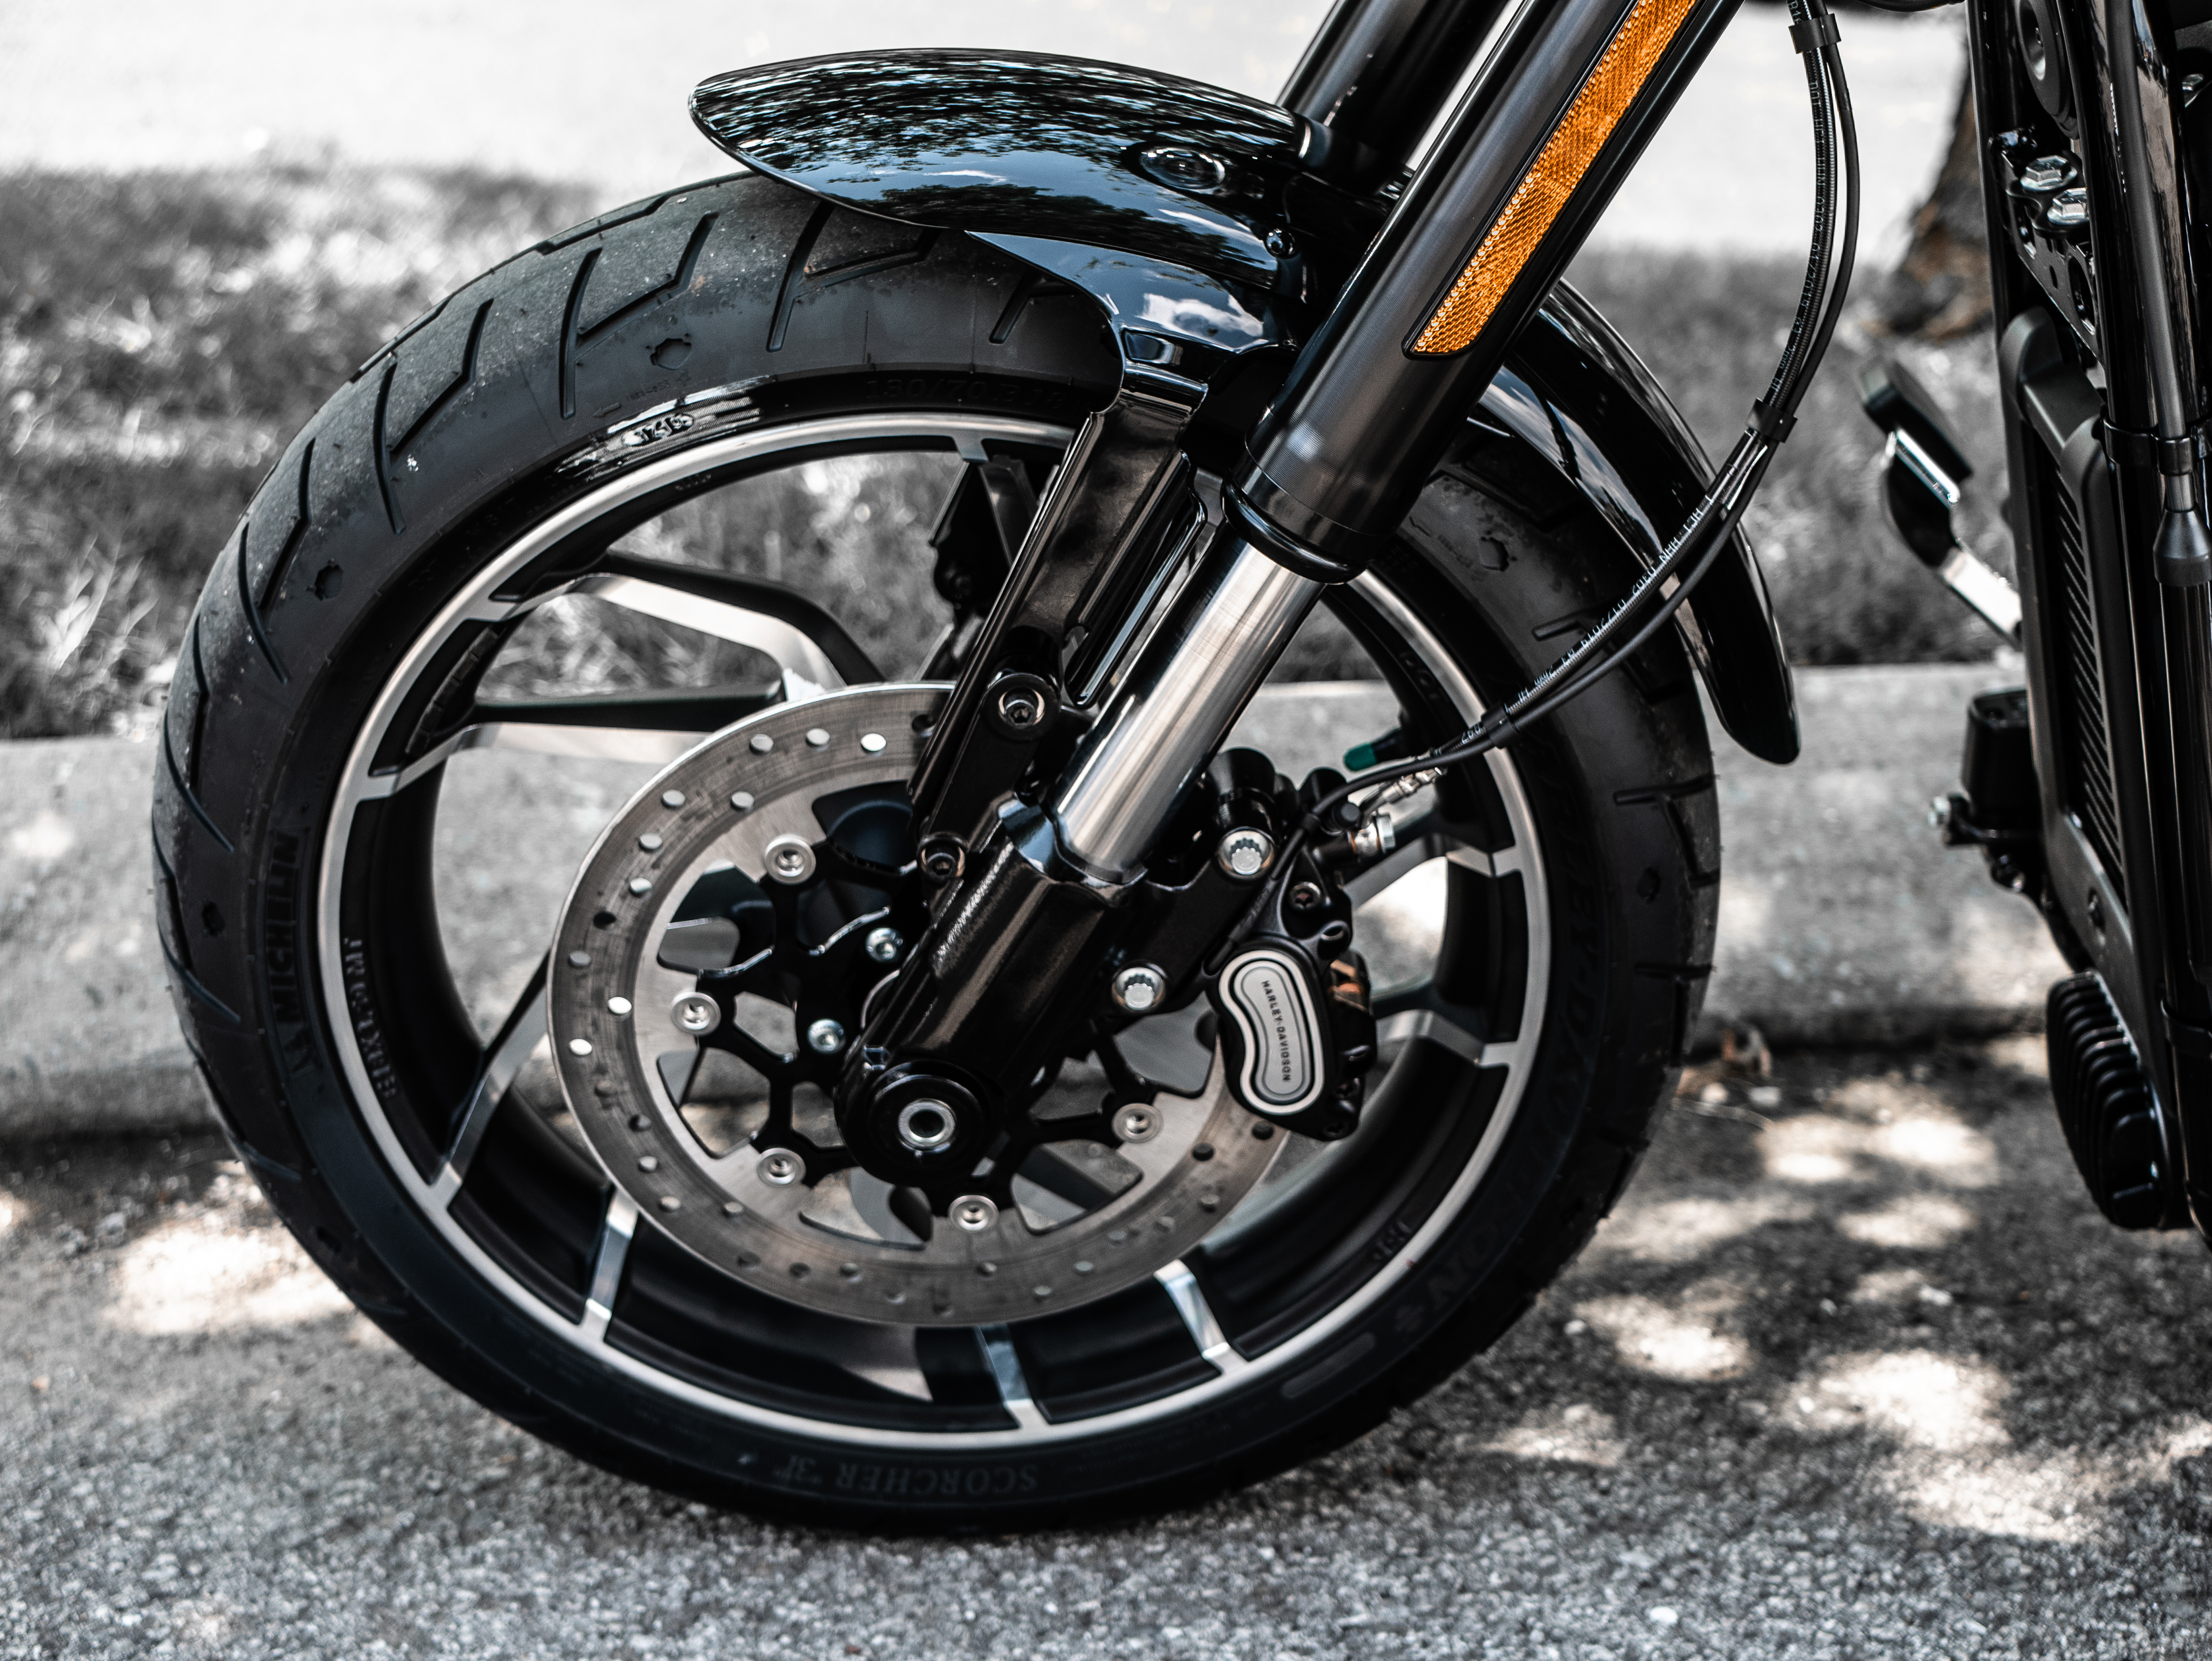 New 2020 Harley-Davidson Sport Glide